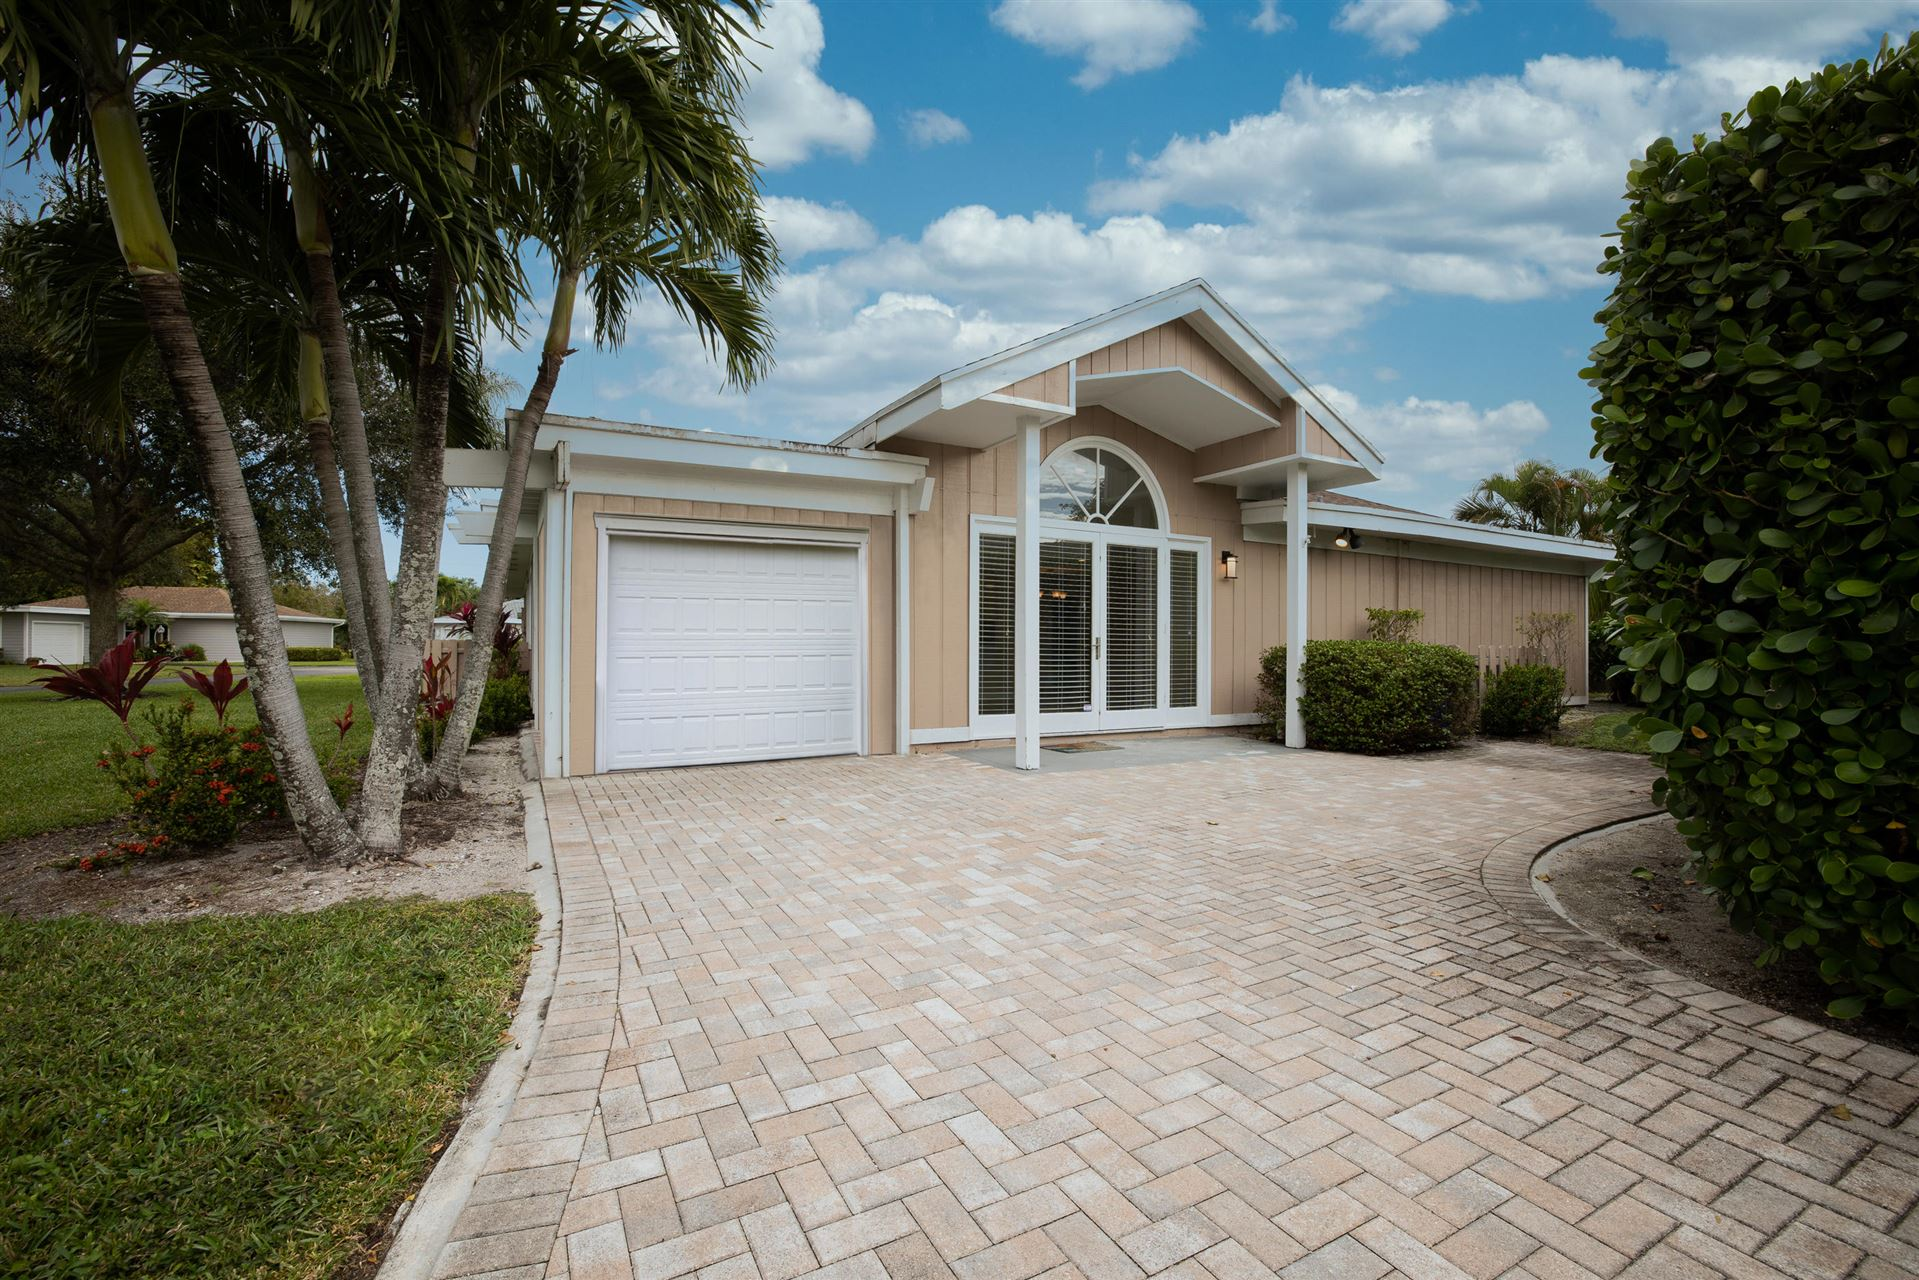 Photo of 13860 Whispering Lakes Lane, West Palm Beach, FL 33418 (MLS # RX-10680401)